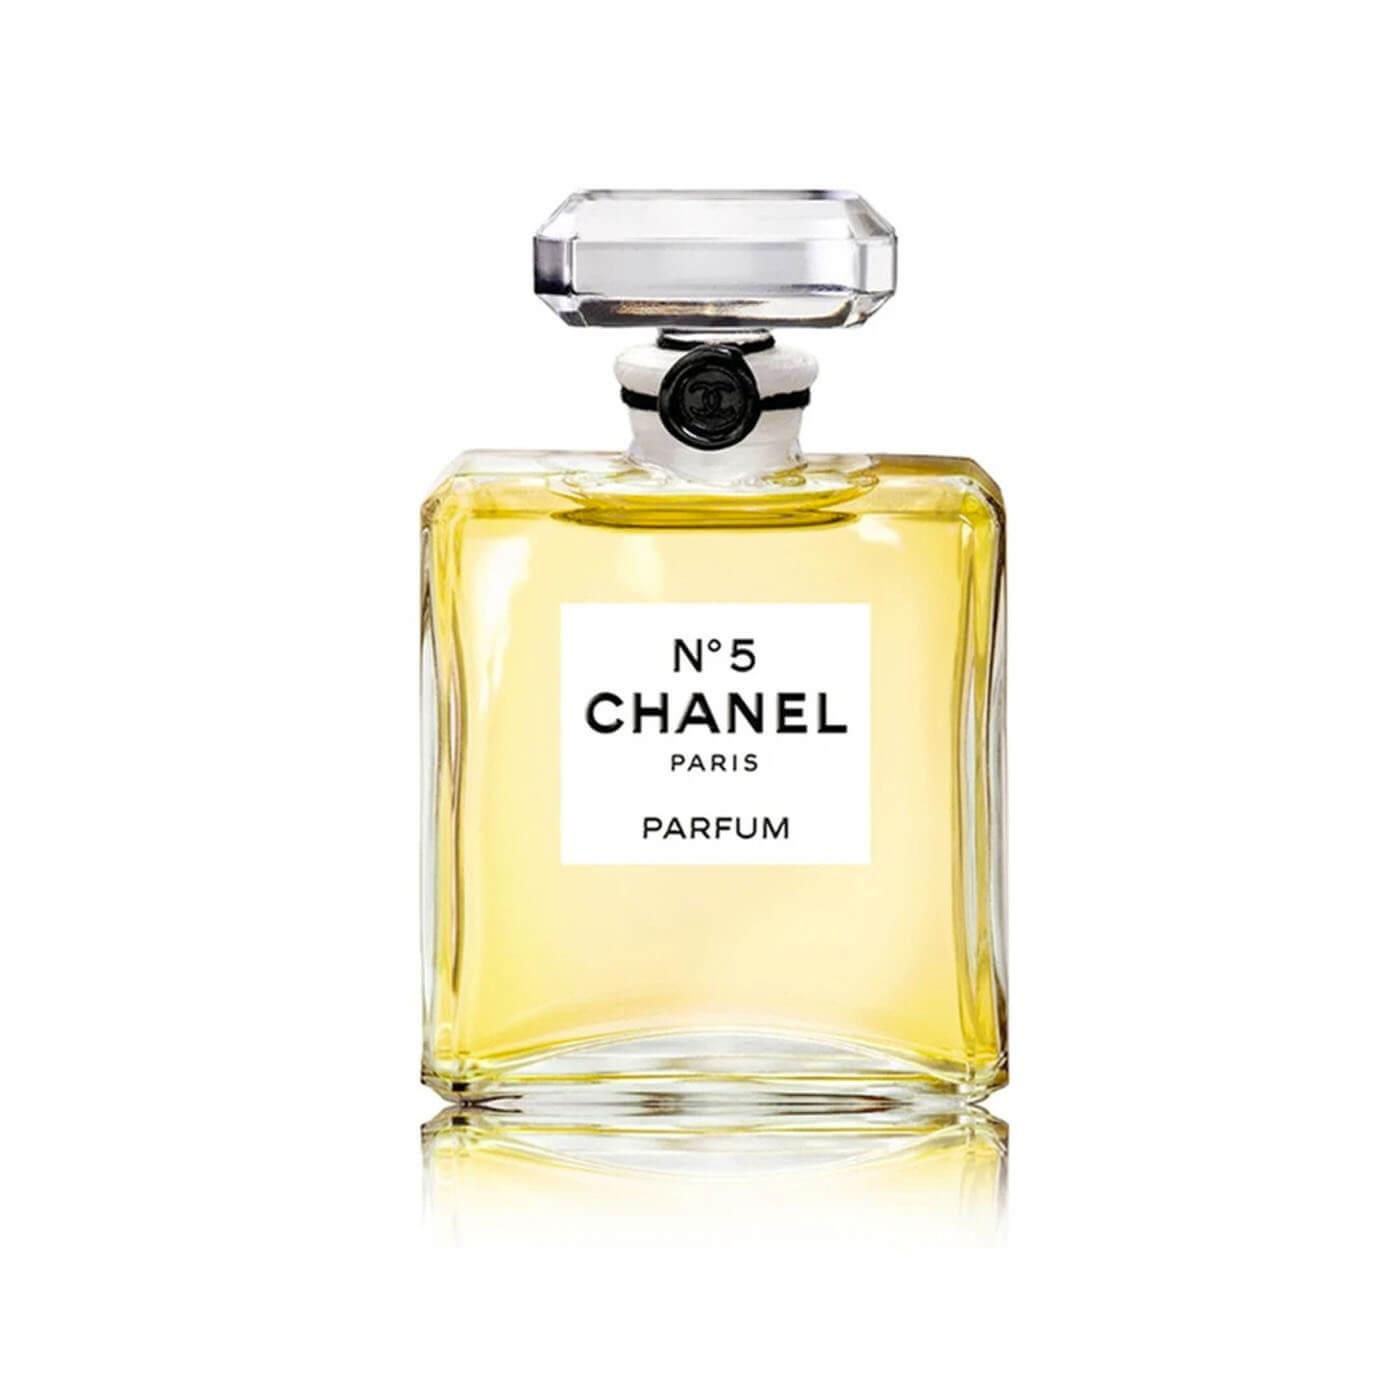 Chanel No. 5 Parfum - parfém30 ml